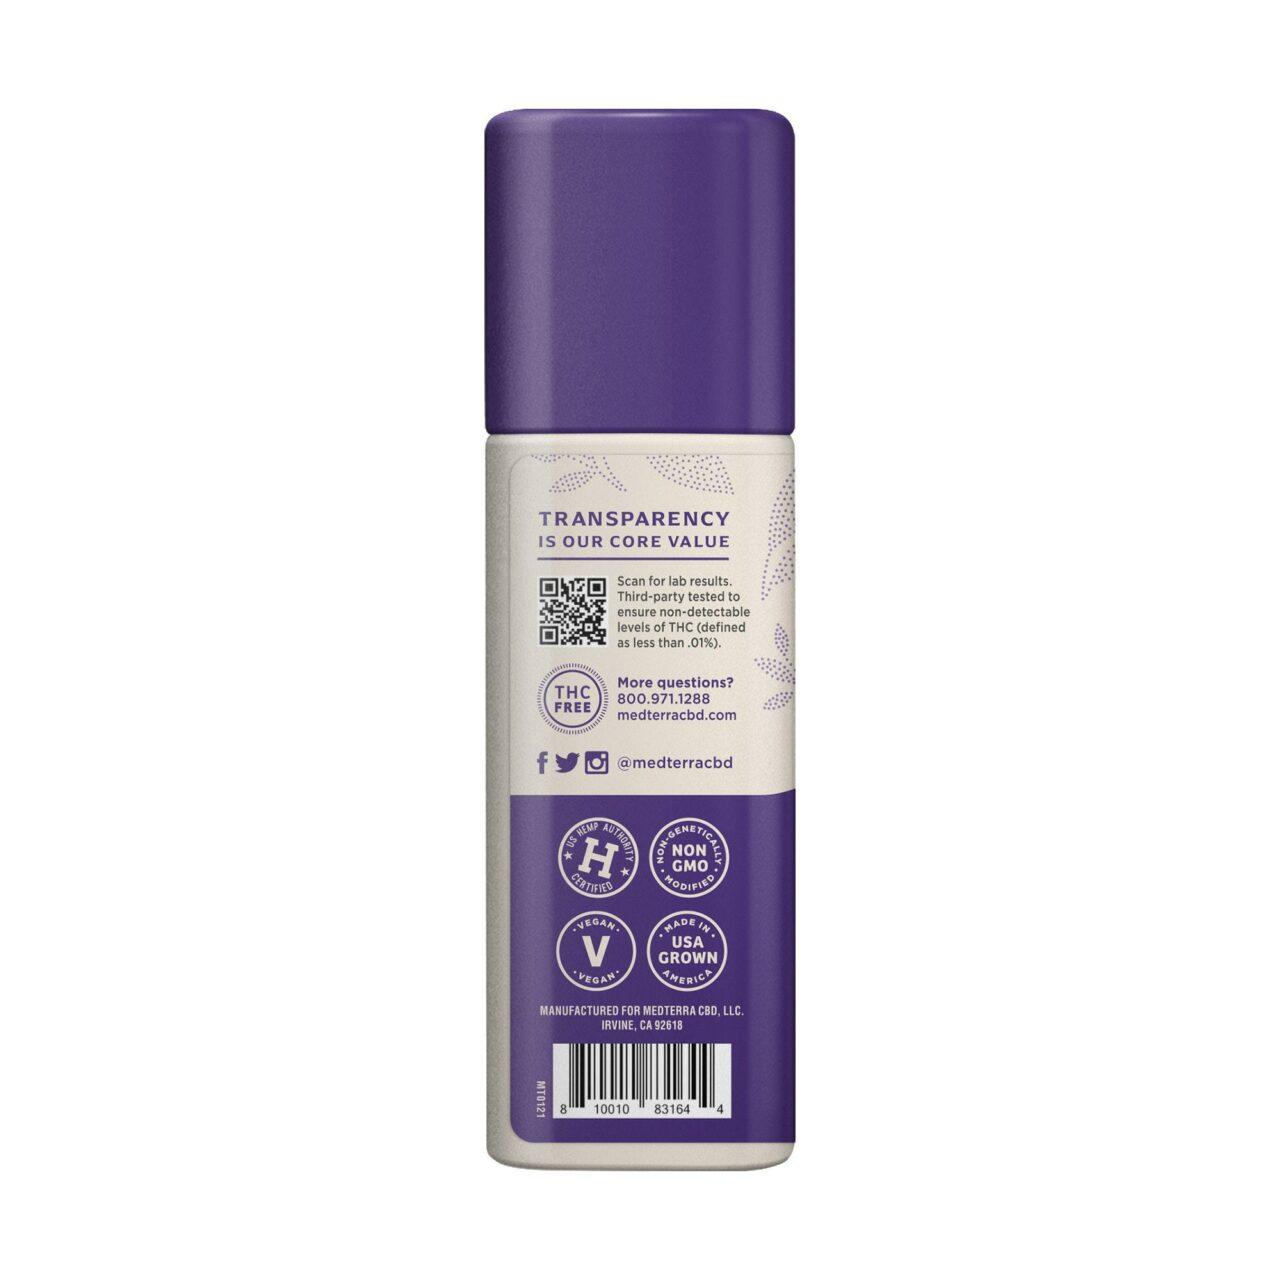 Medterra, Wellness Nature's Relief Daily CBD Cream, Broad Spectrum THC-Free, 1.7oz, 1000mg CBD 3